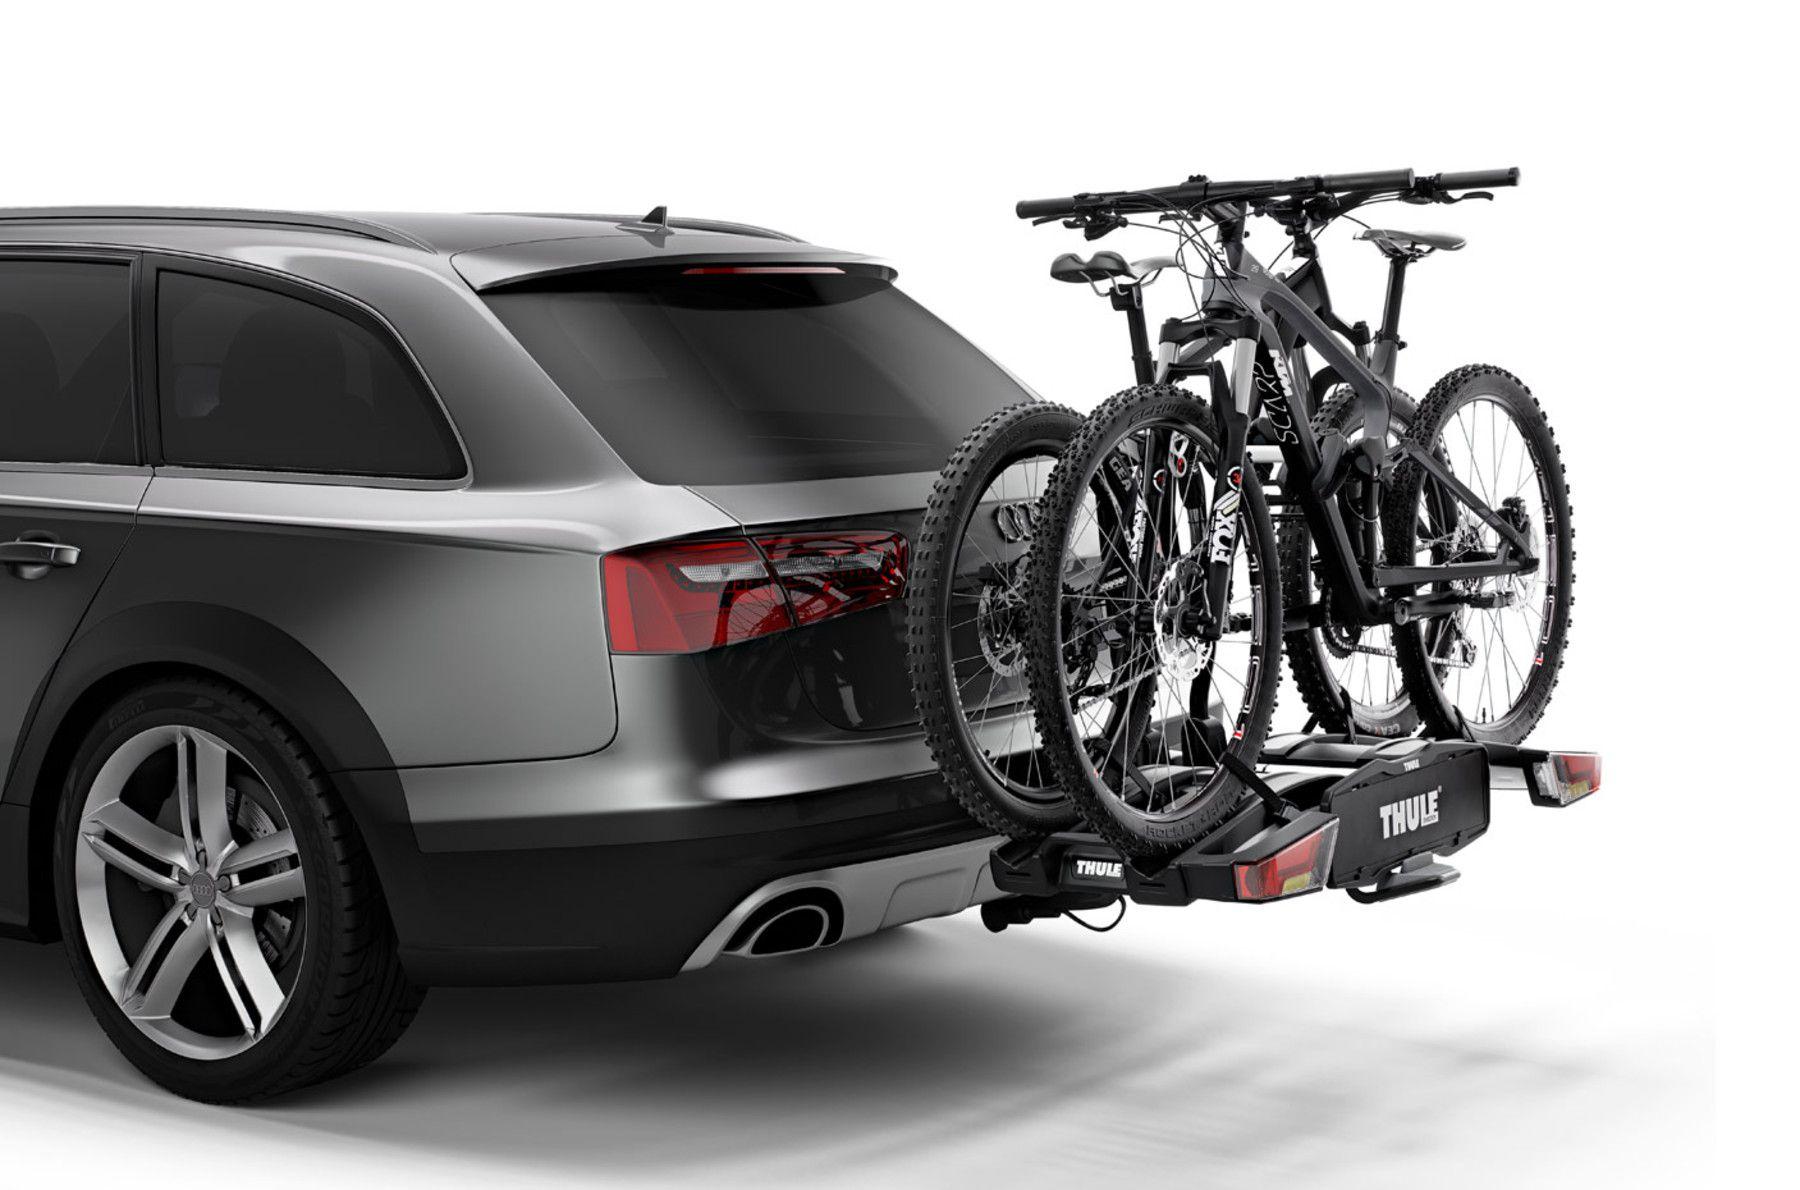 Suporte de Engate para Bicicleta Thule EasyFold XT 2